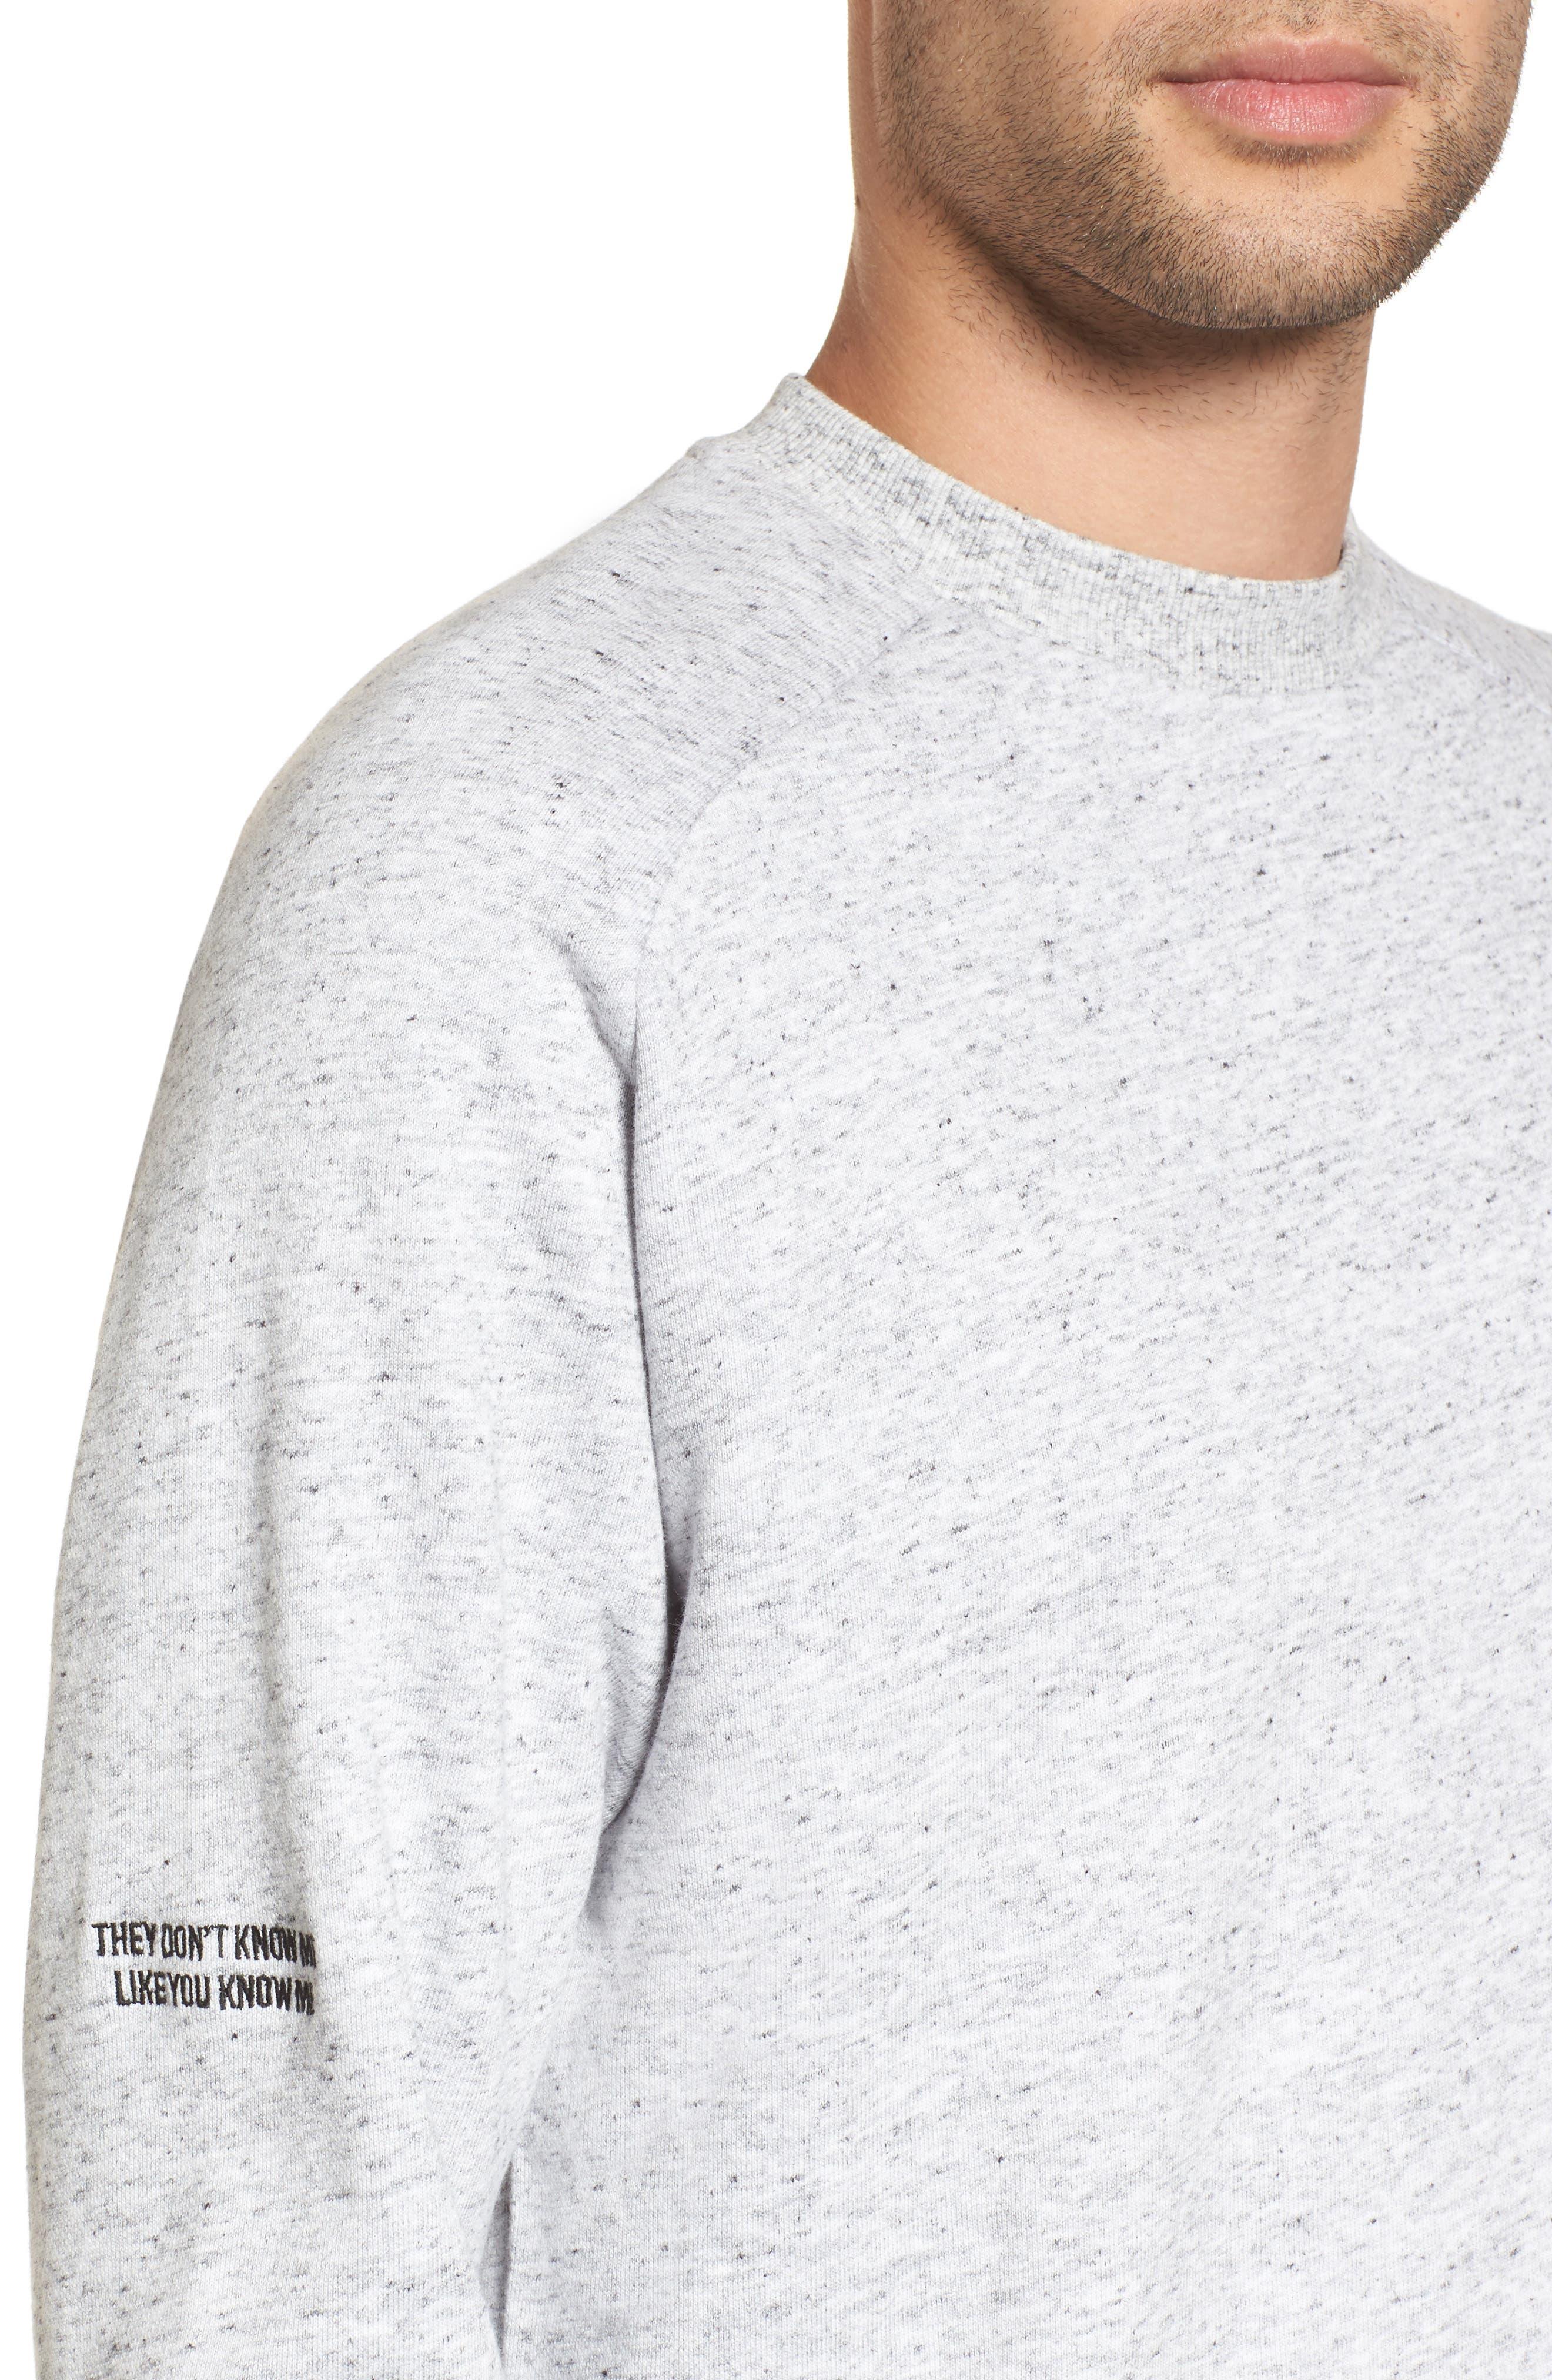 Torn Crew Sweatshirt,                             Alternate thumbnail 4, color,                             059